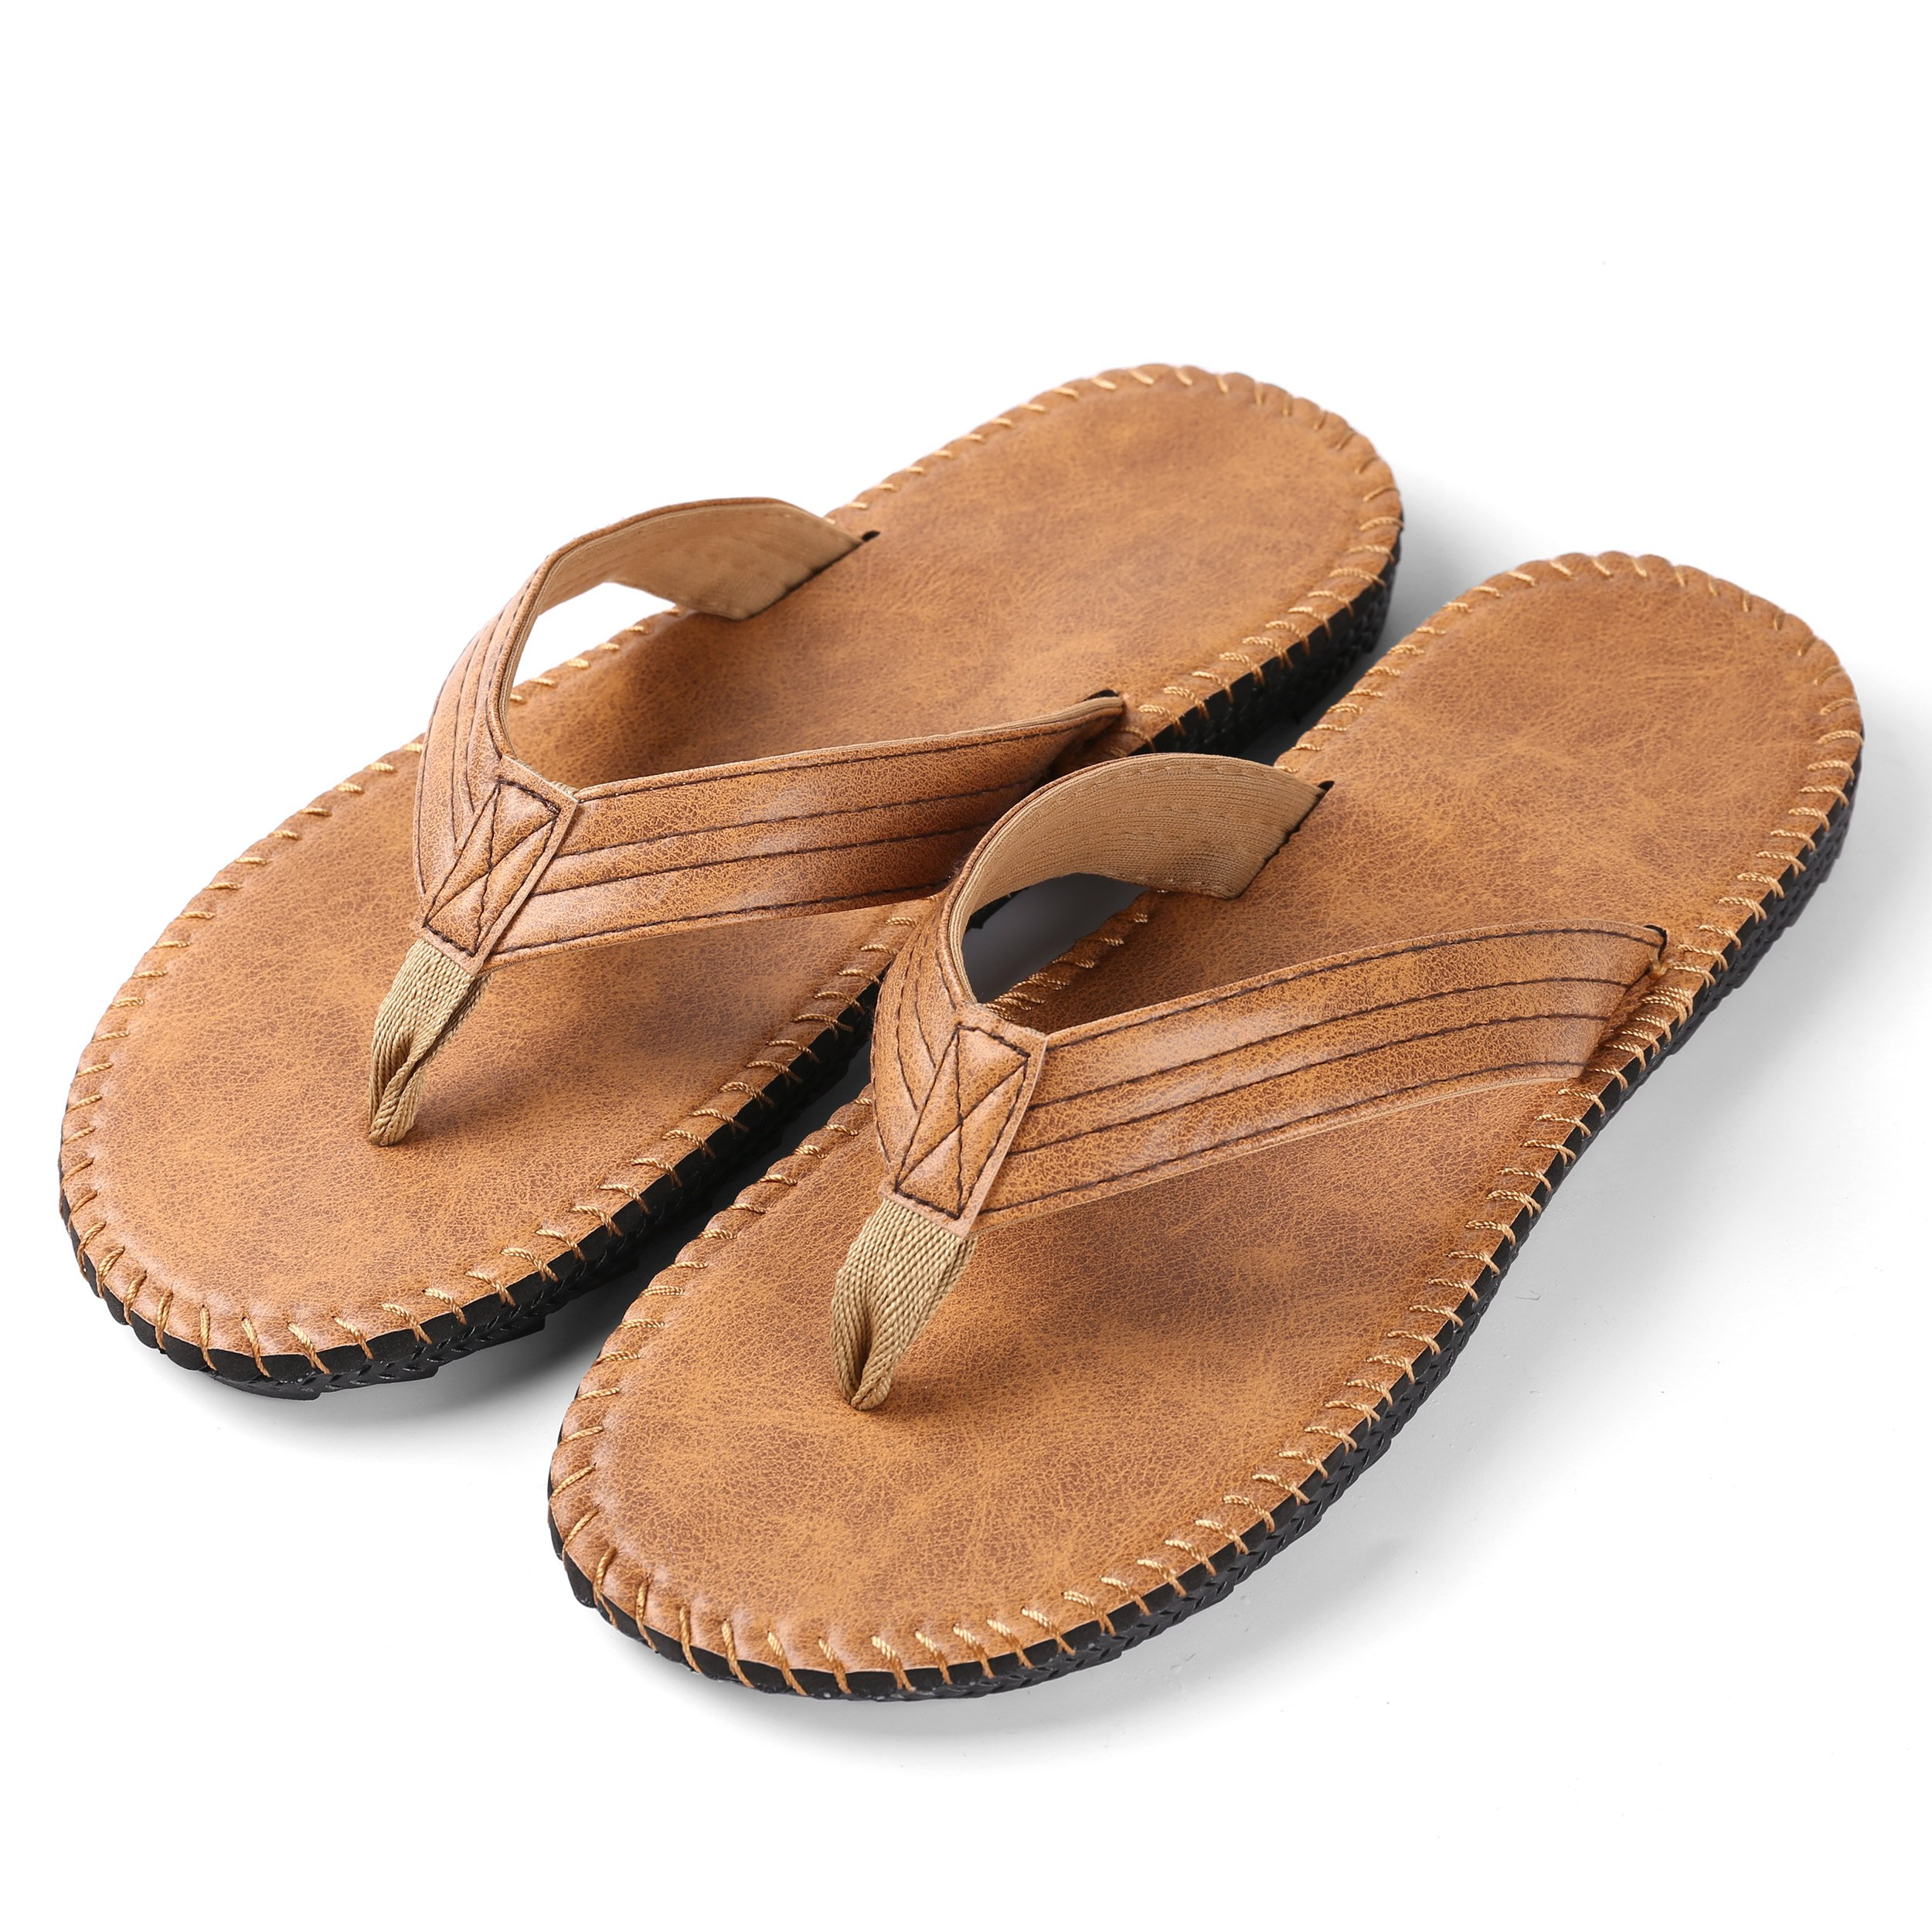 Aerusi Men's PU Leather Thong Slipper Summer Beach Outdoor Sandals Flip Flop (Size 10, Tan)